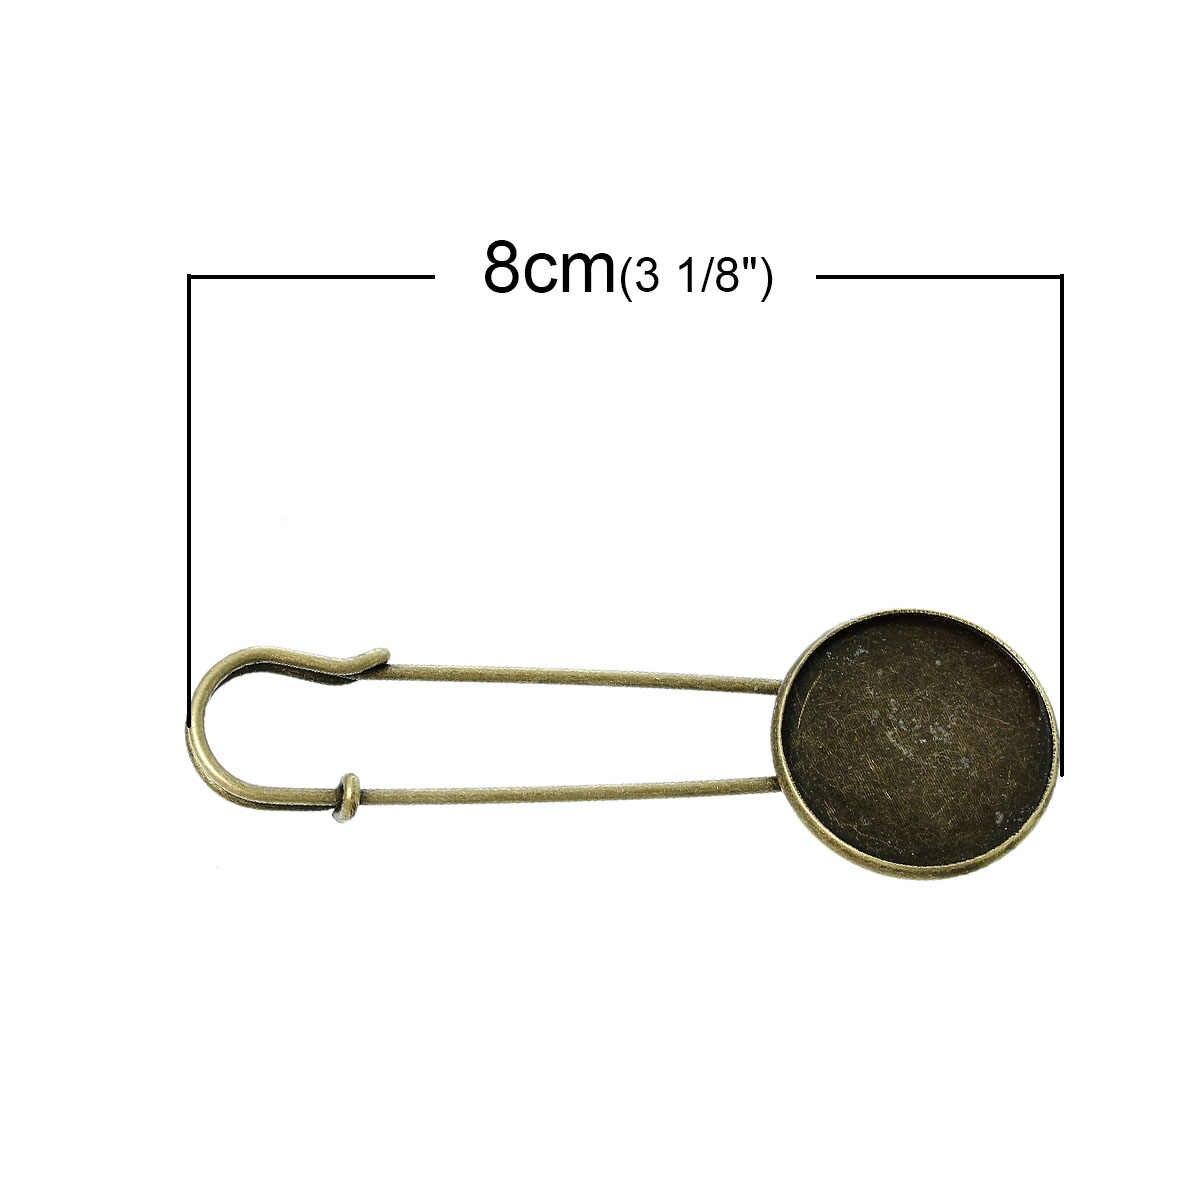 "DoreenBeads סגסוגת סיכות ממצאי עגול עתיק ברונזה הגדרות קרושון (מתאים 25mm) 80mm (3 1/8 "") x 27mm (1 1/8""), 1 חתיכה 2015 חדש"